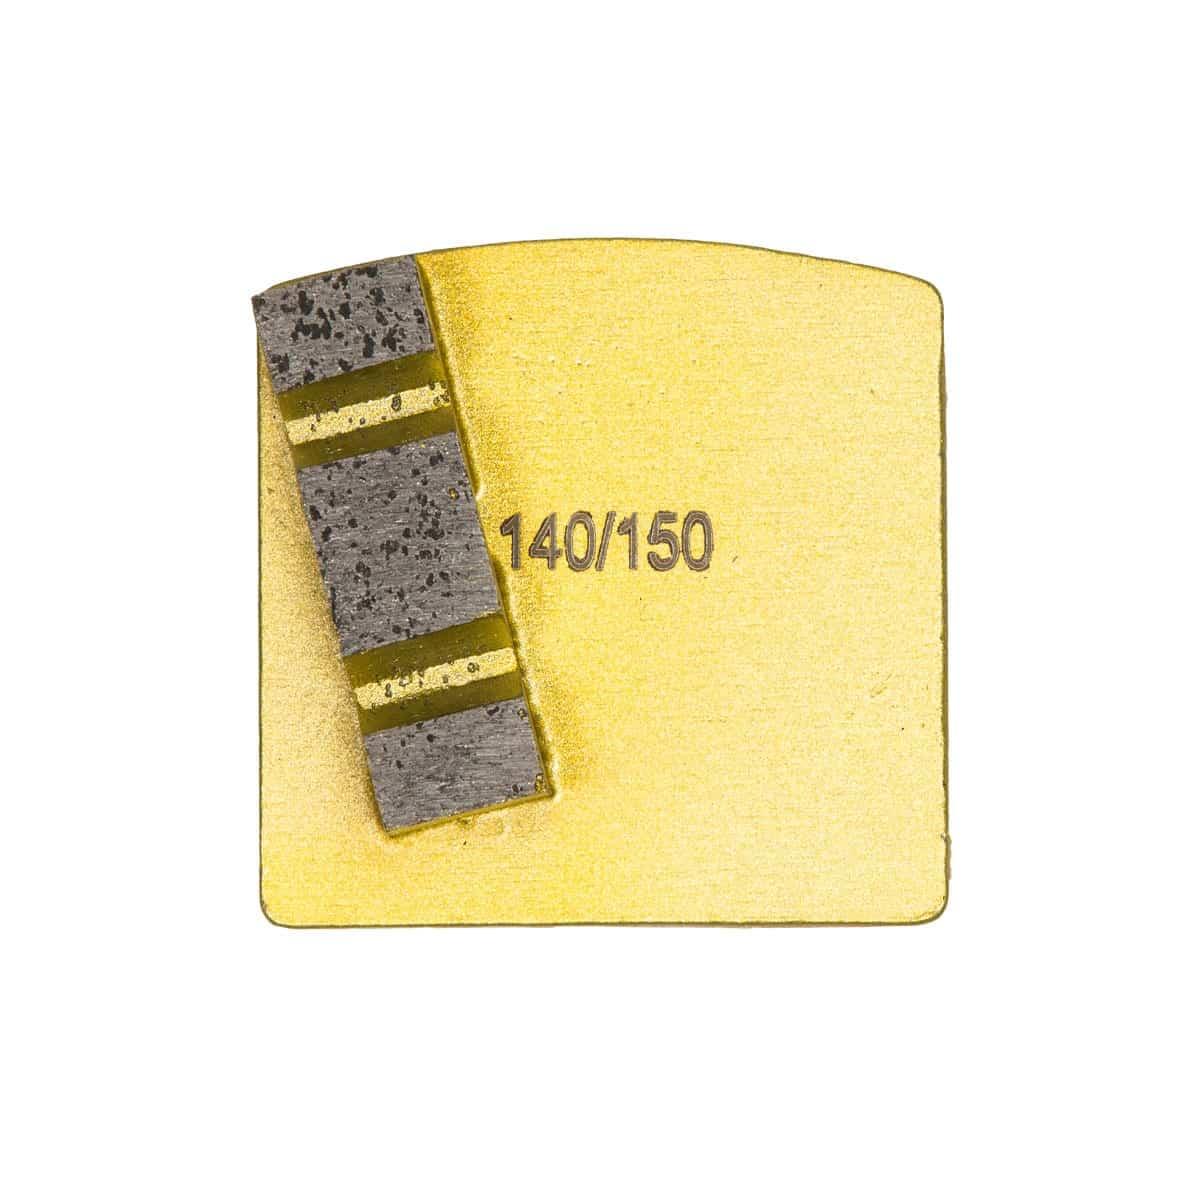 Scanmaskin World Series Diamond 8mm Single Gold Soft Bond Concrete Grinding Tool